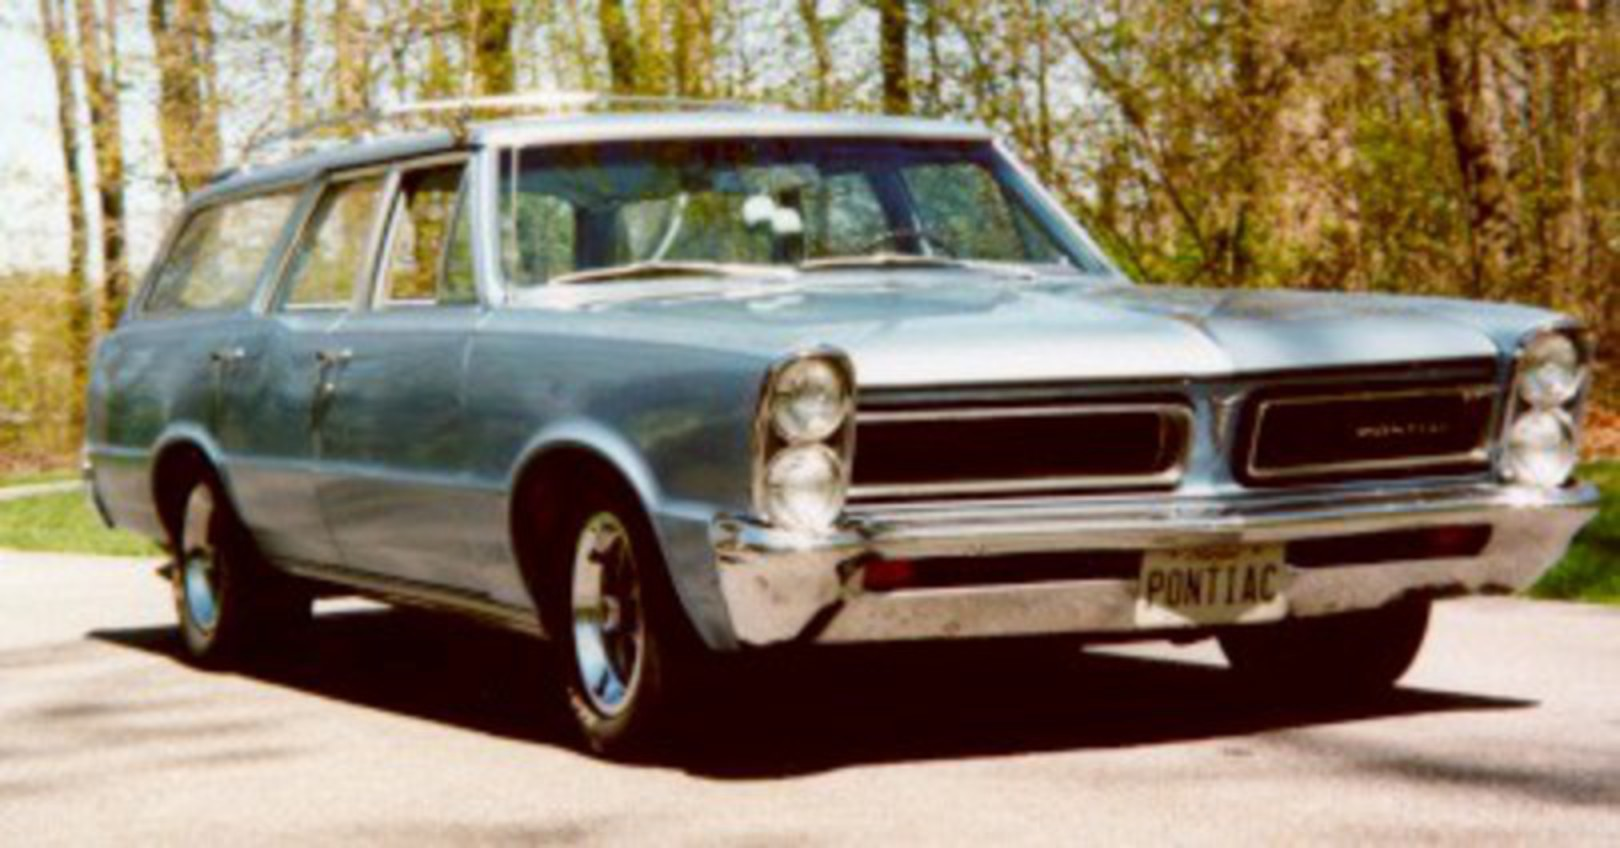 topworldauto photos of pontiac tempest wagon photo galleries 1961 Pontiac Safari Station Wagon pontiac tempest wagon